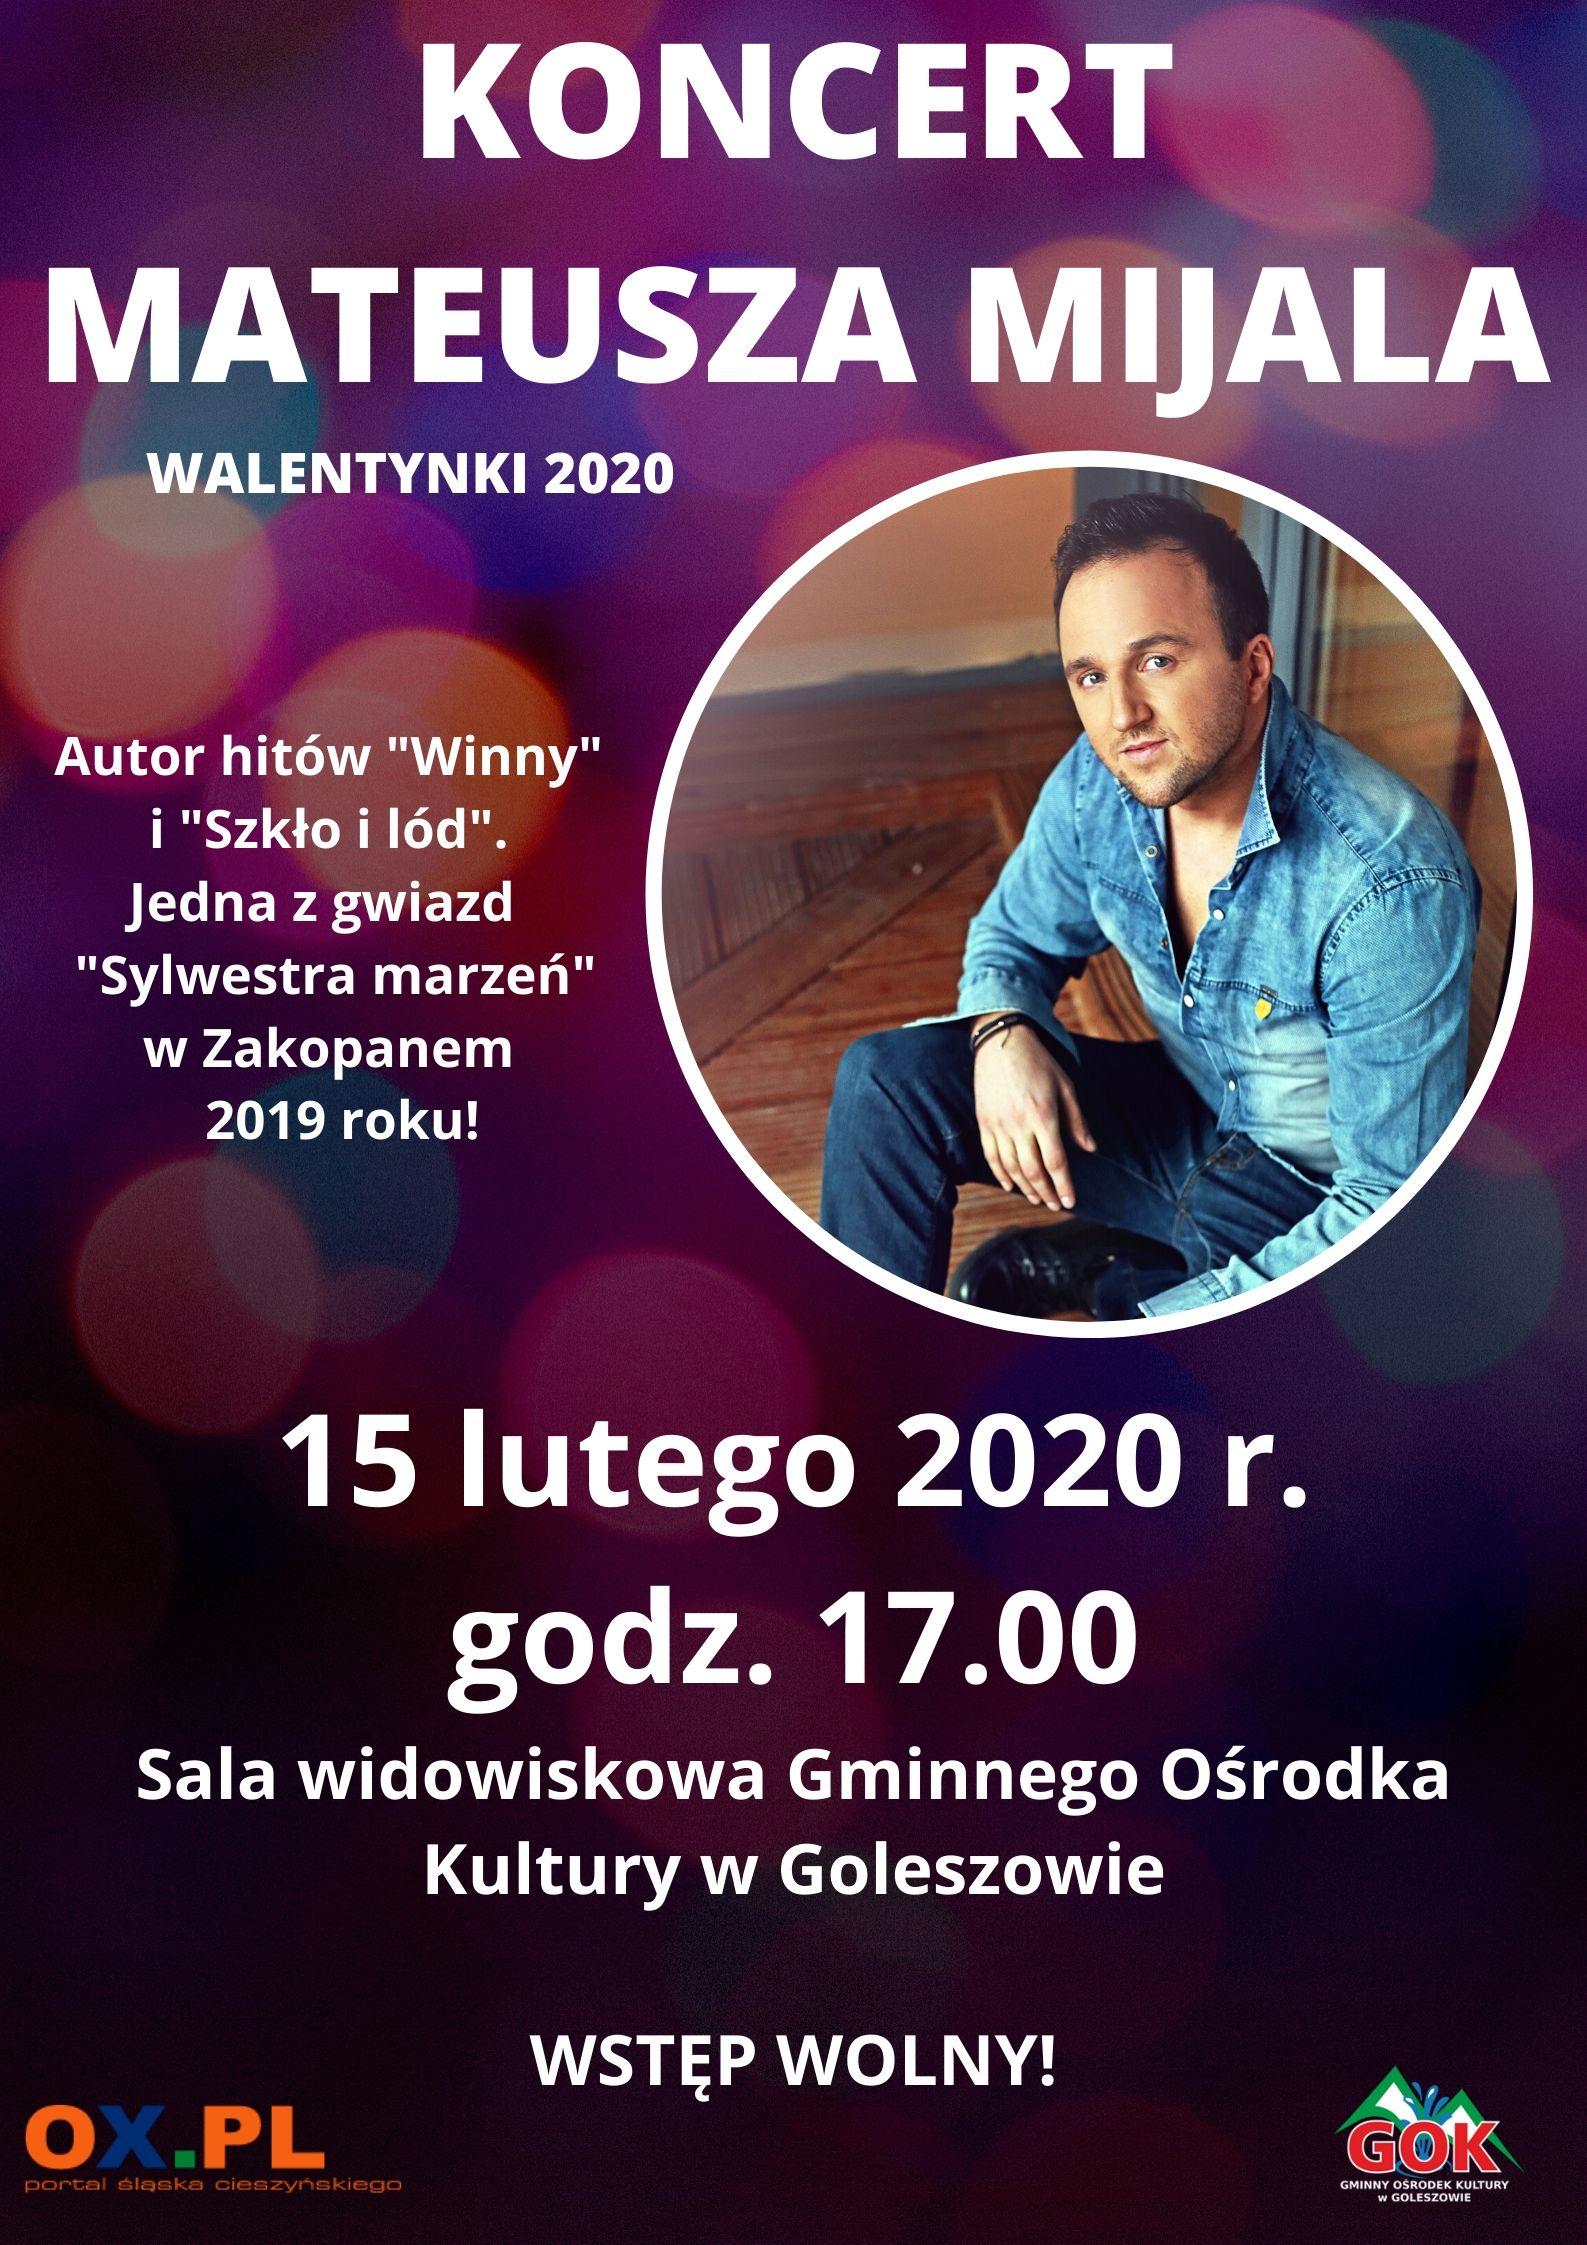 Koncert Mateusza Mijala - Walentynki 2020